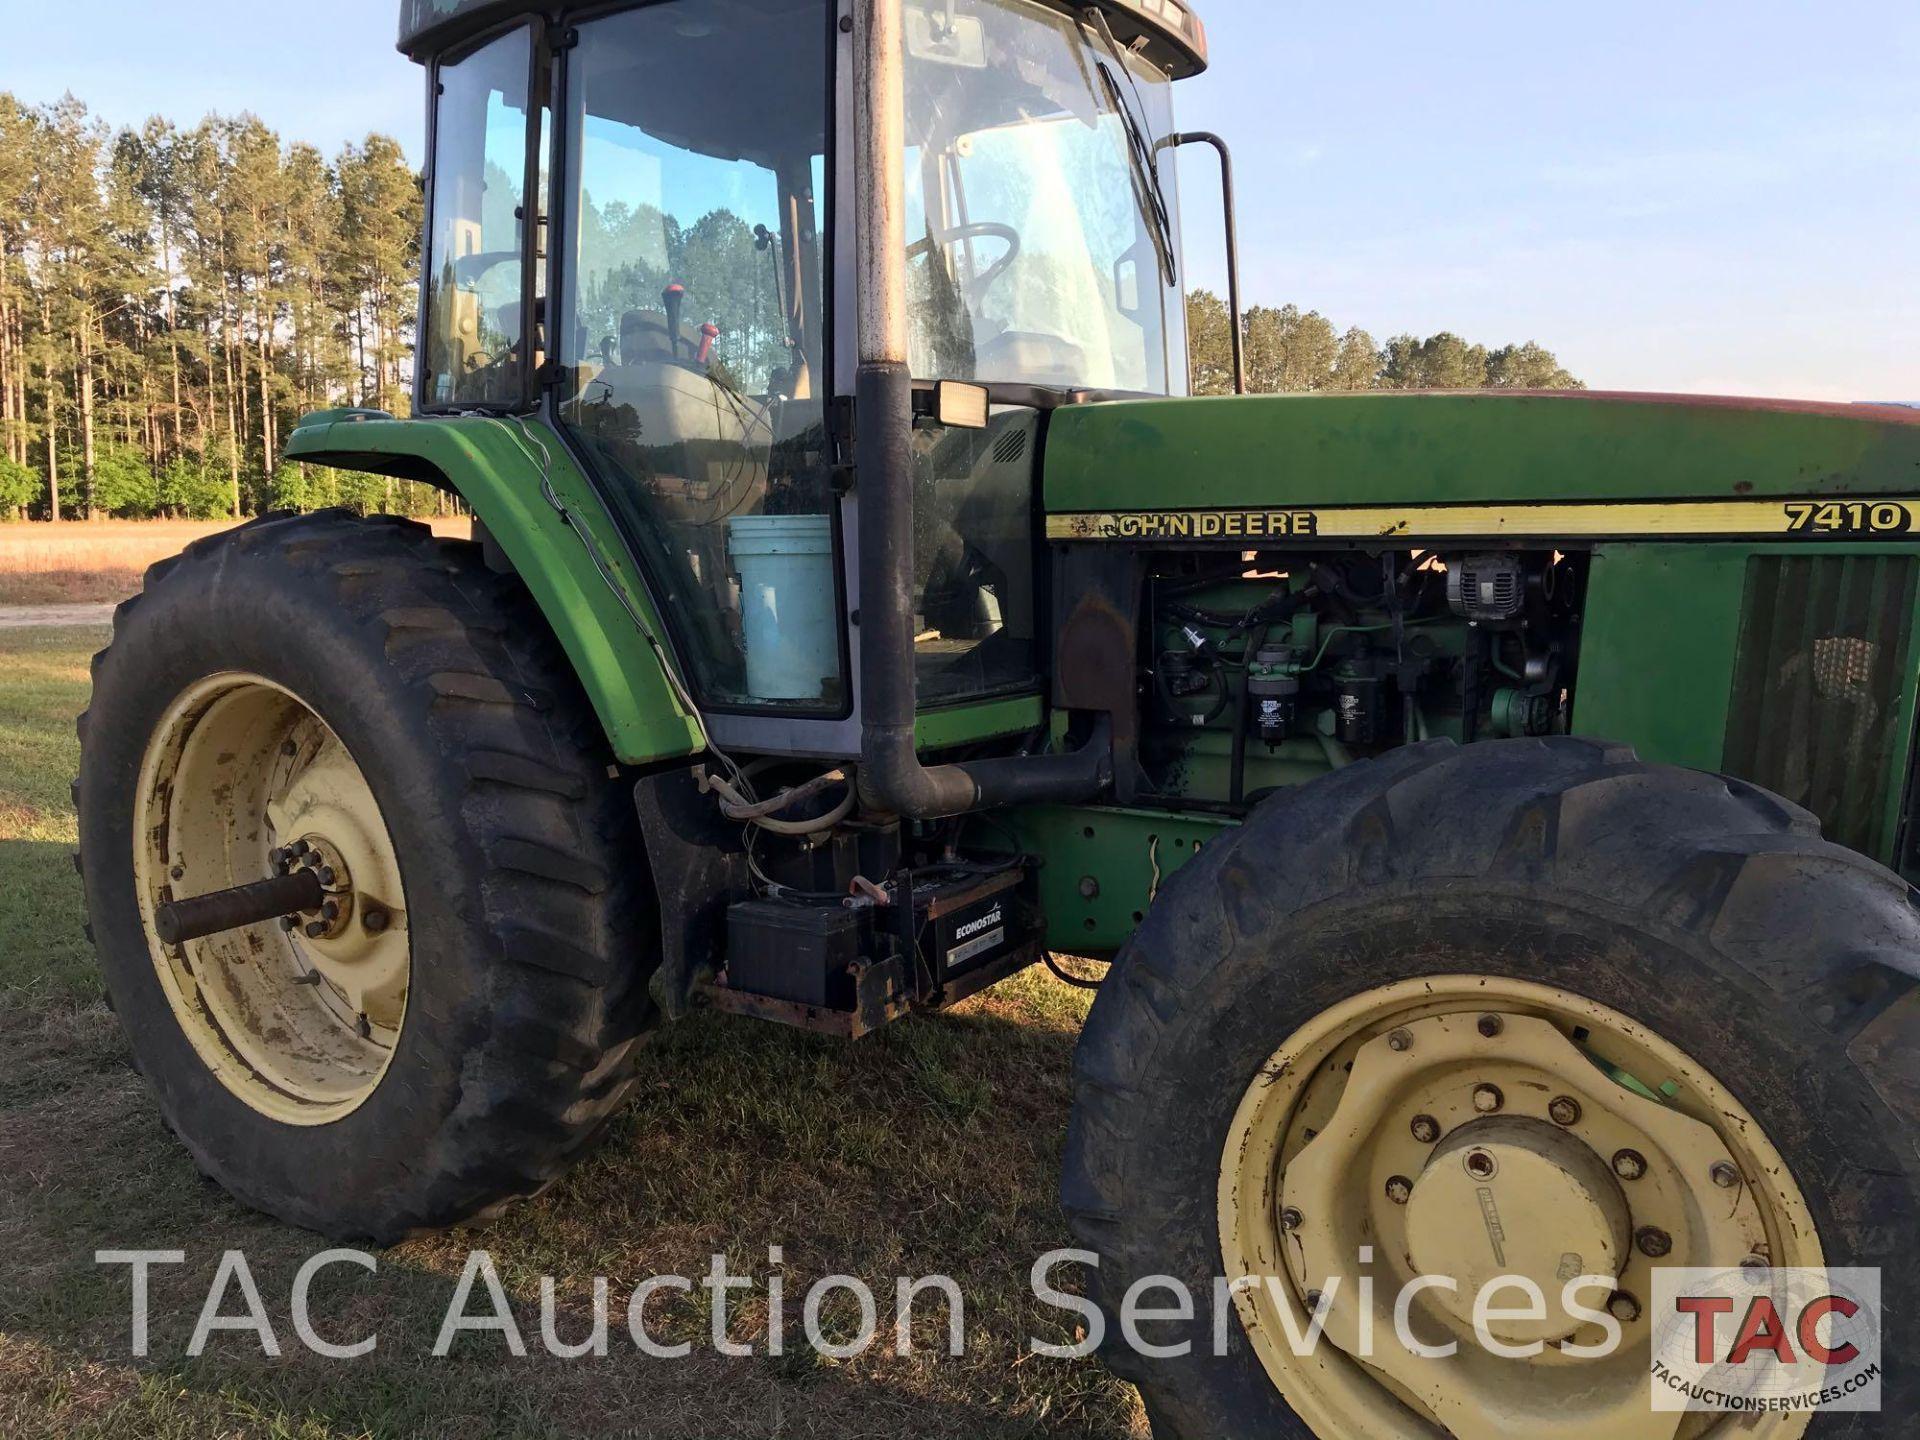 John Deere 7410 Farm Tractor - Image 7 of 24